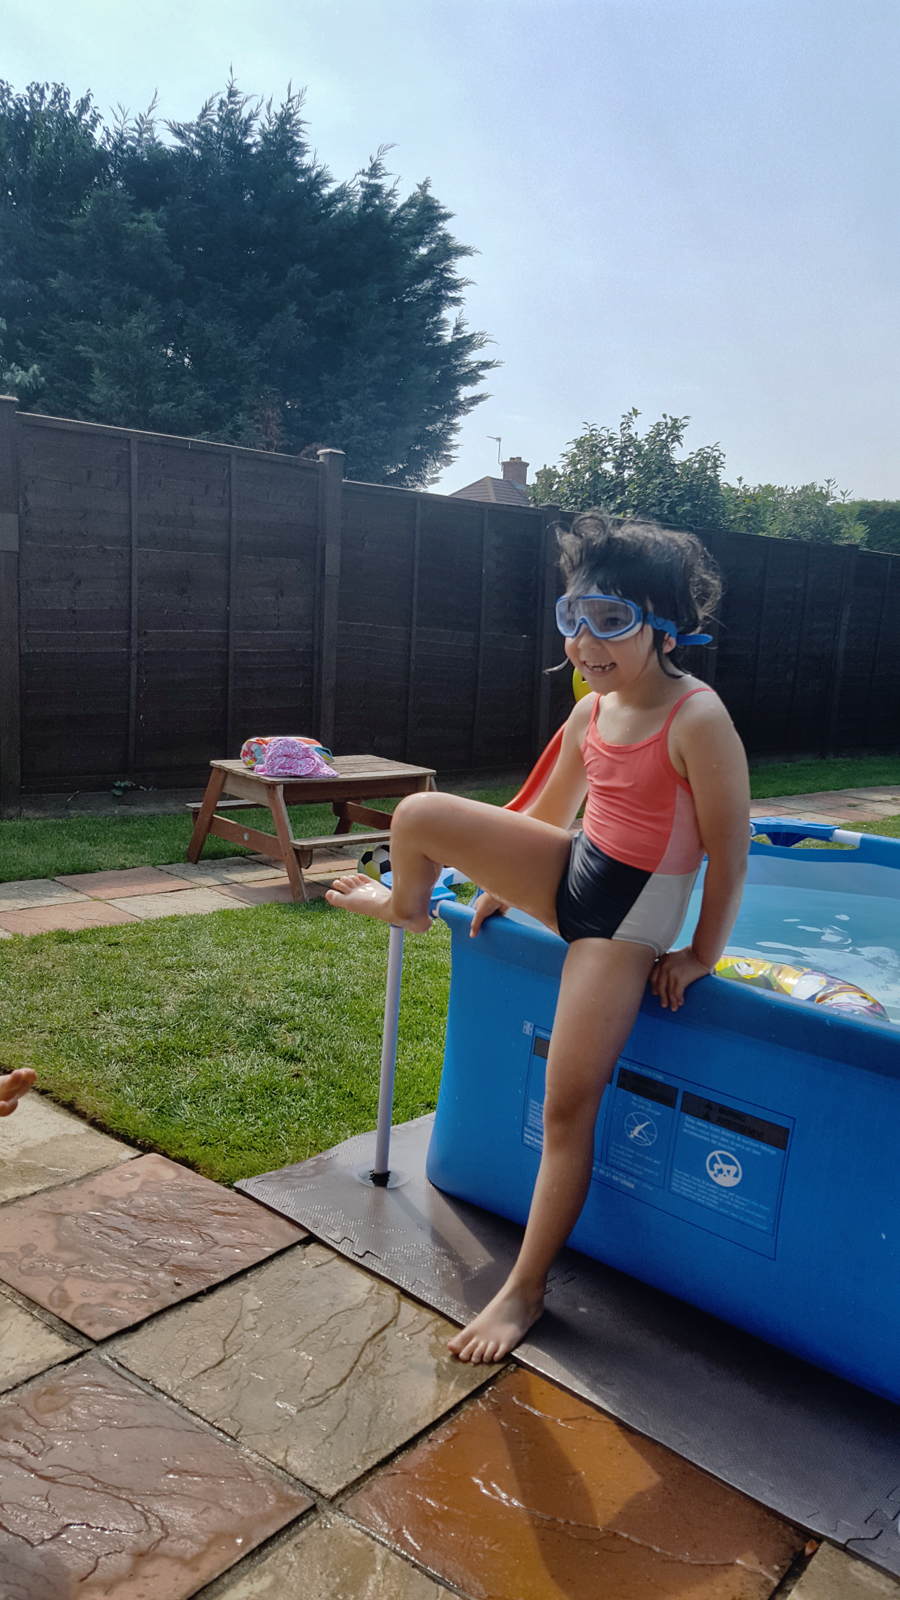 mia england swimming-pool